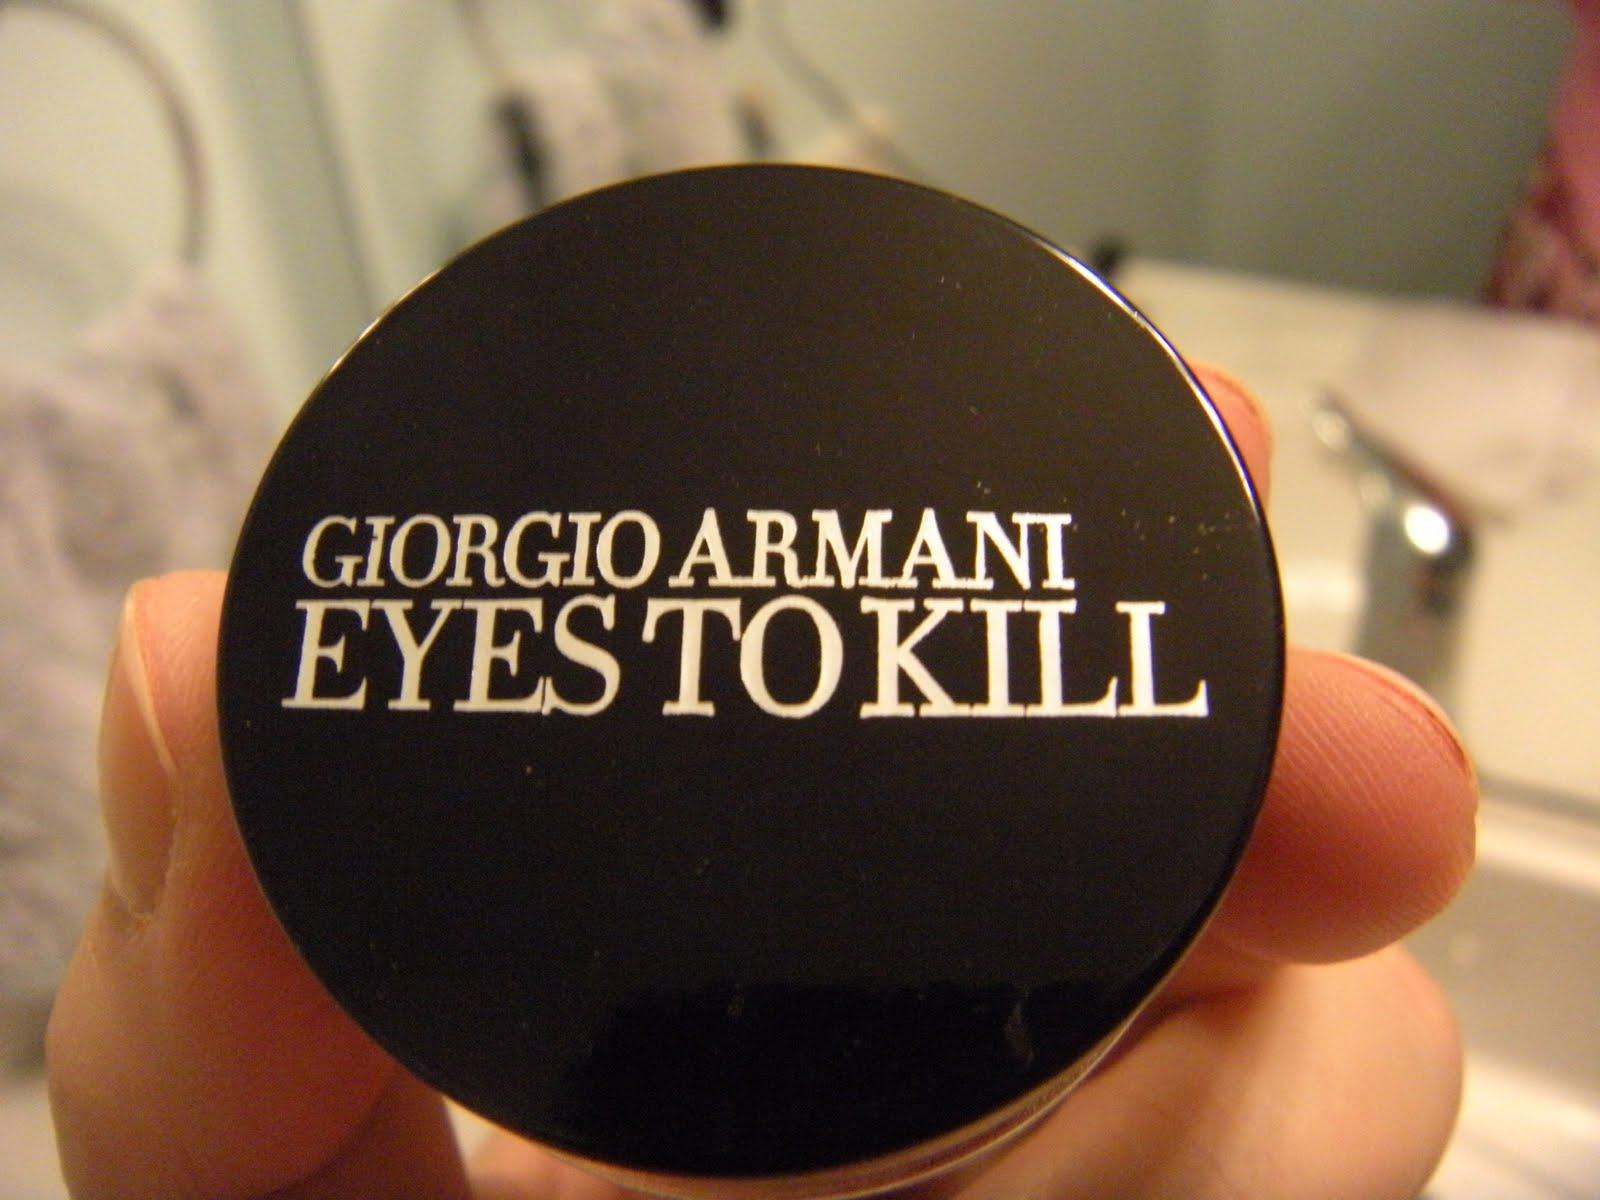 coloring book beauty giorgio armani eyes to kill looks. Black Bedroom Furniture Sets. Home Design Ideas